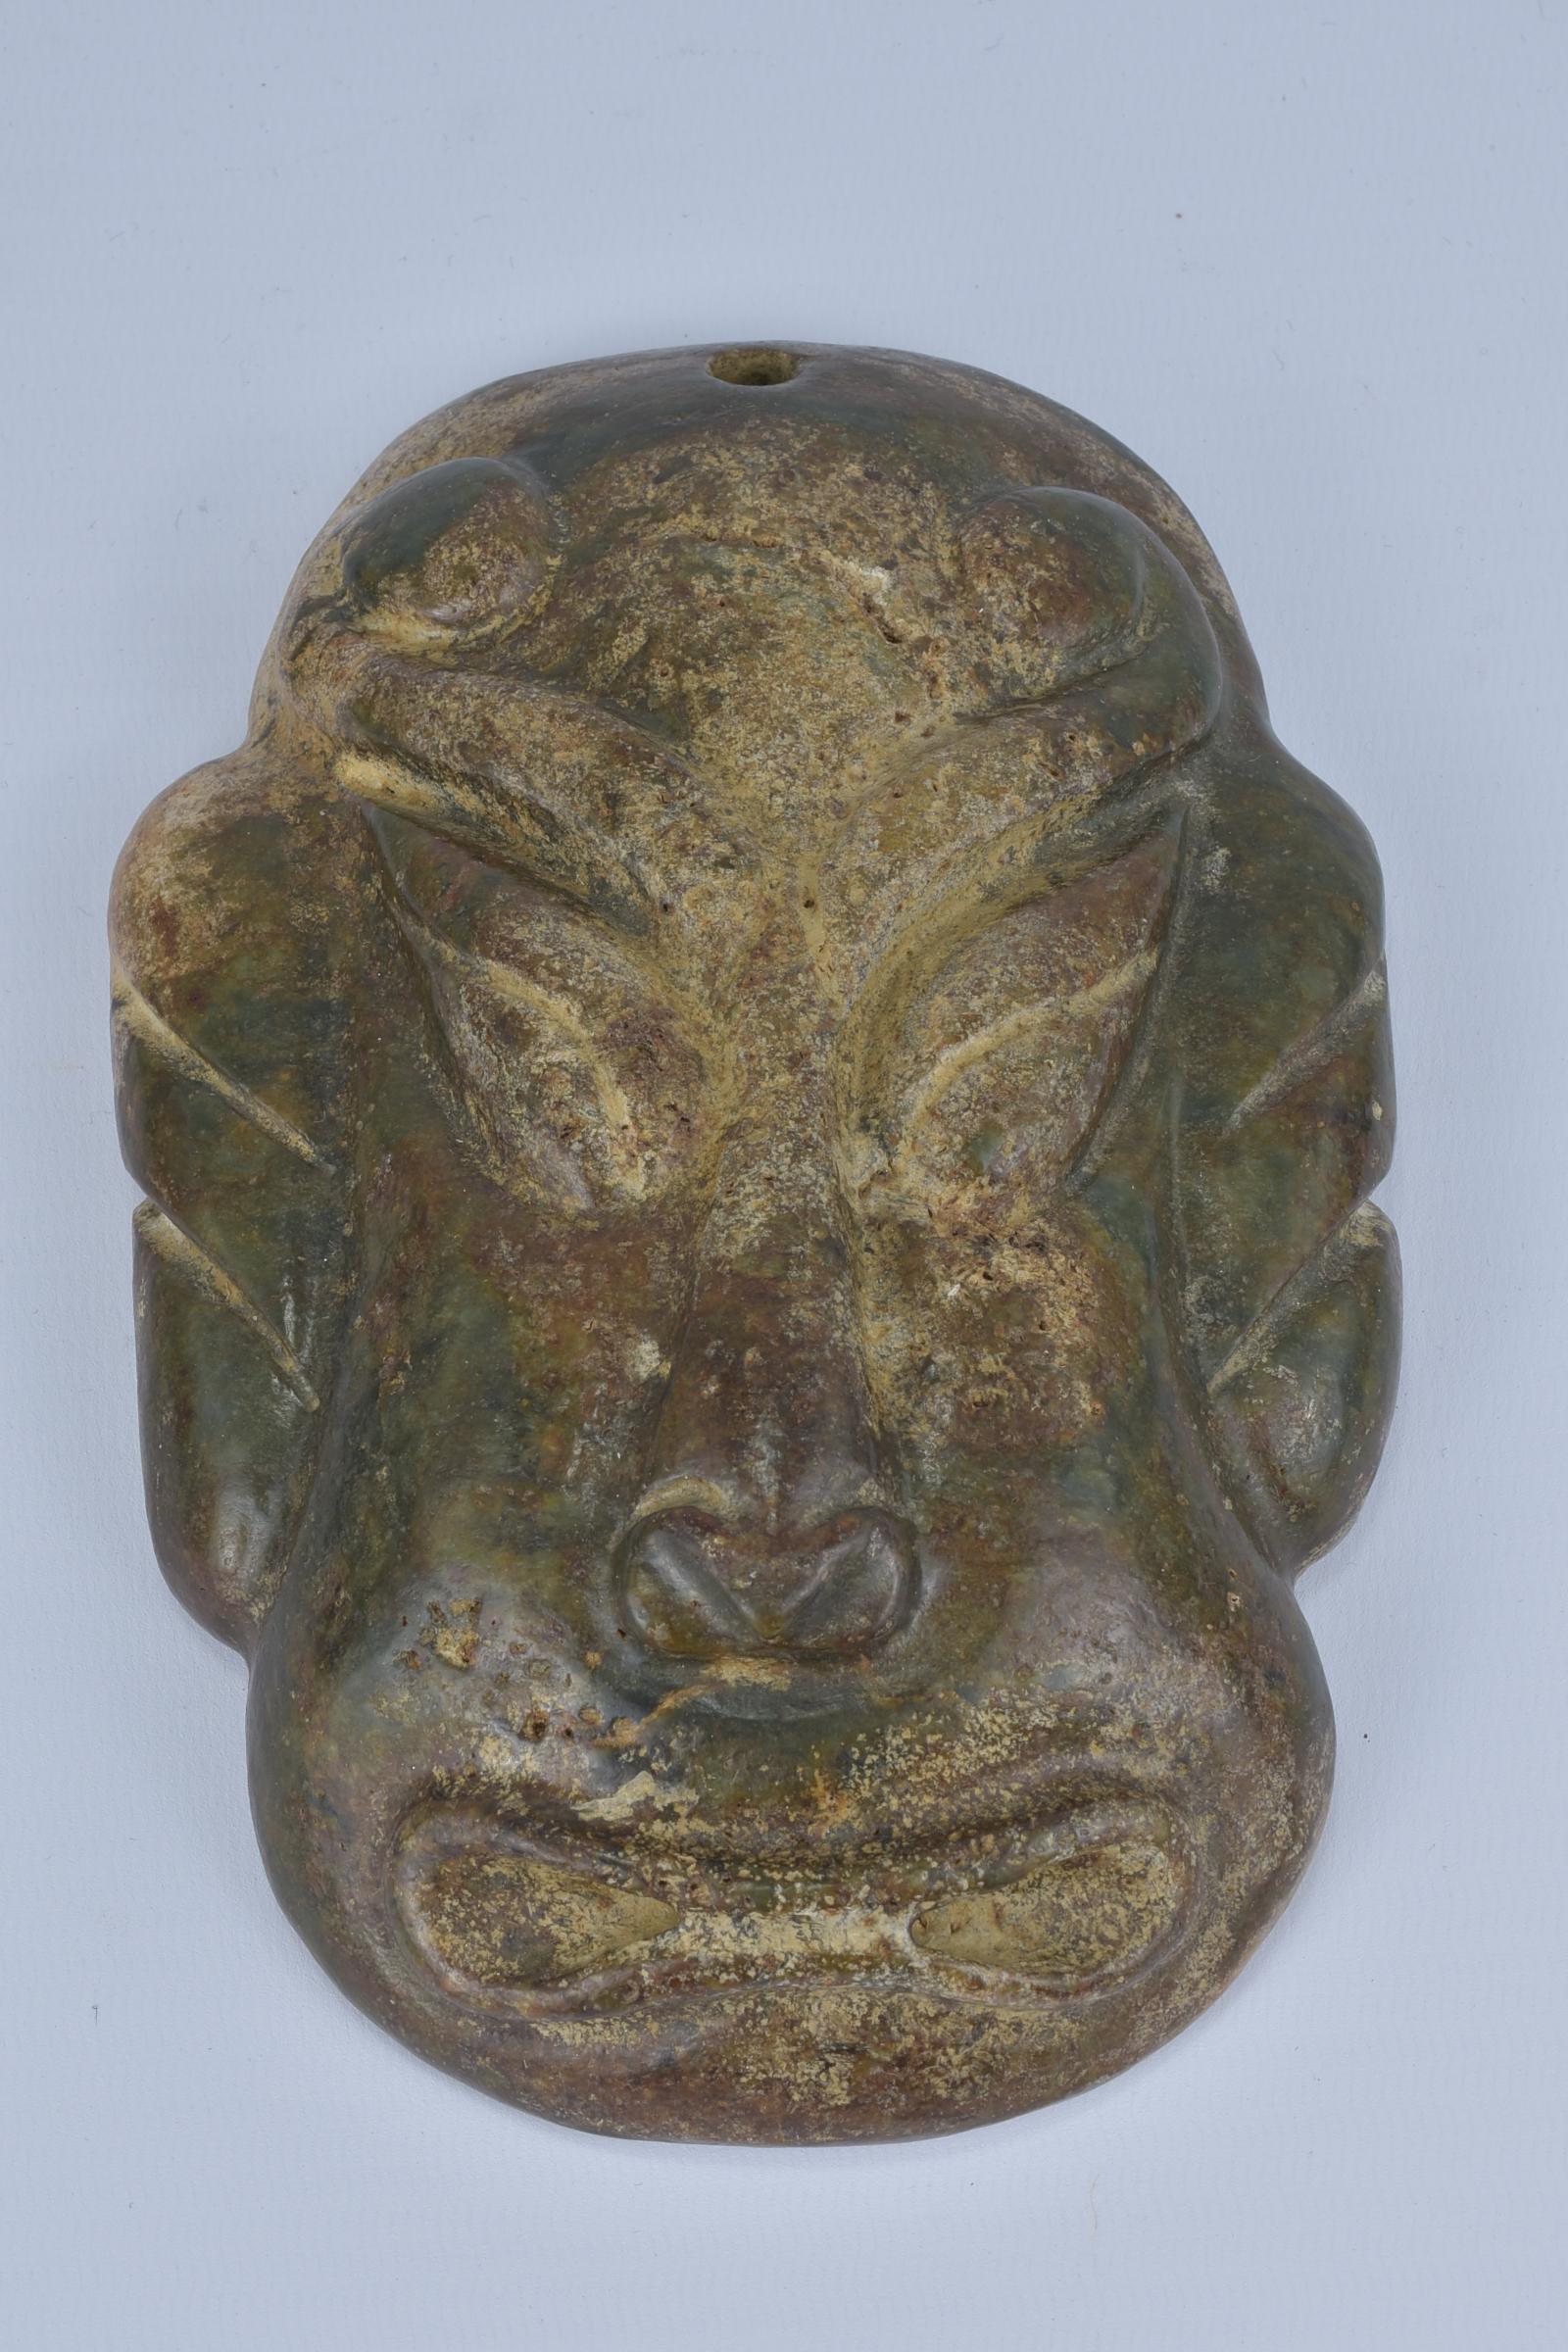 Lot 8 - A large archaic style stone mask pendant. 9cm width